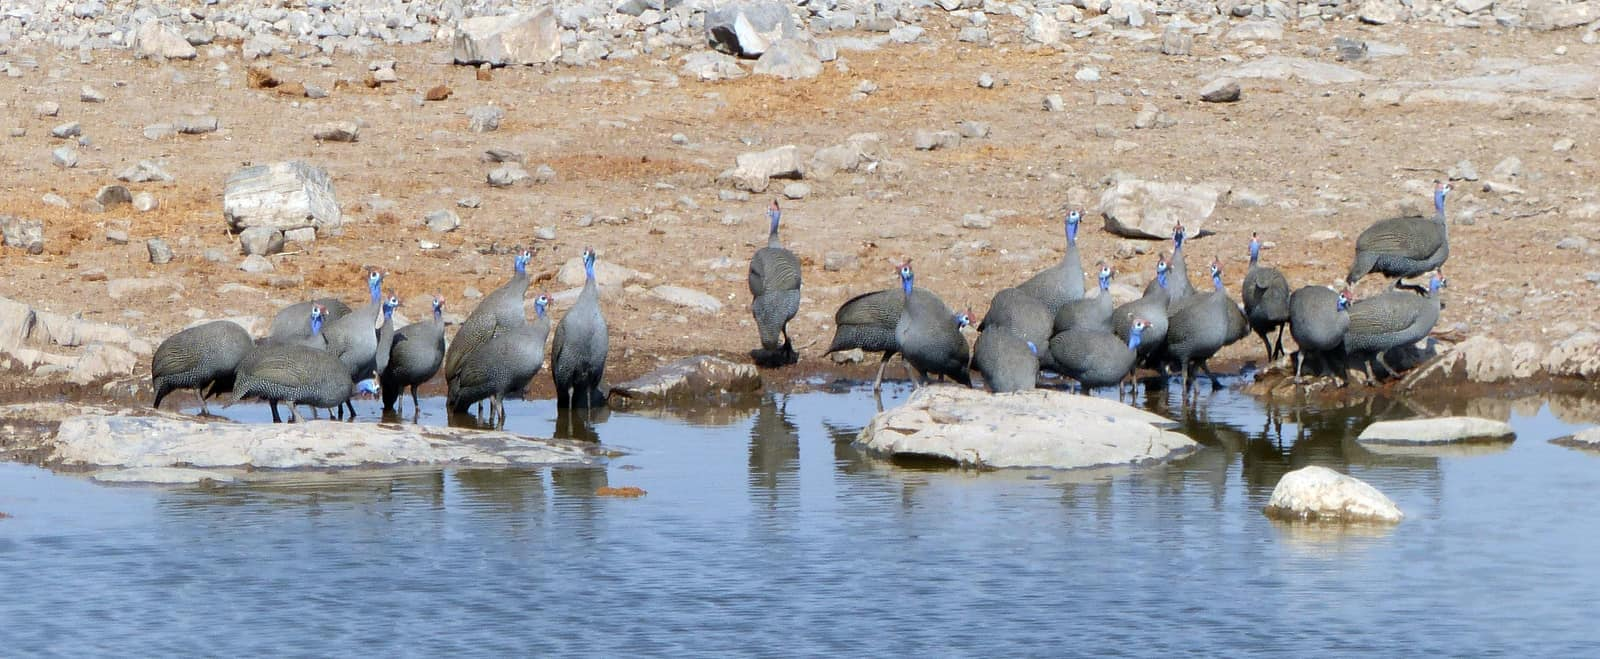 Guinea Fowls at a Waterhole in Etosha